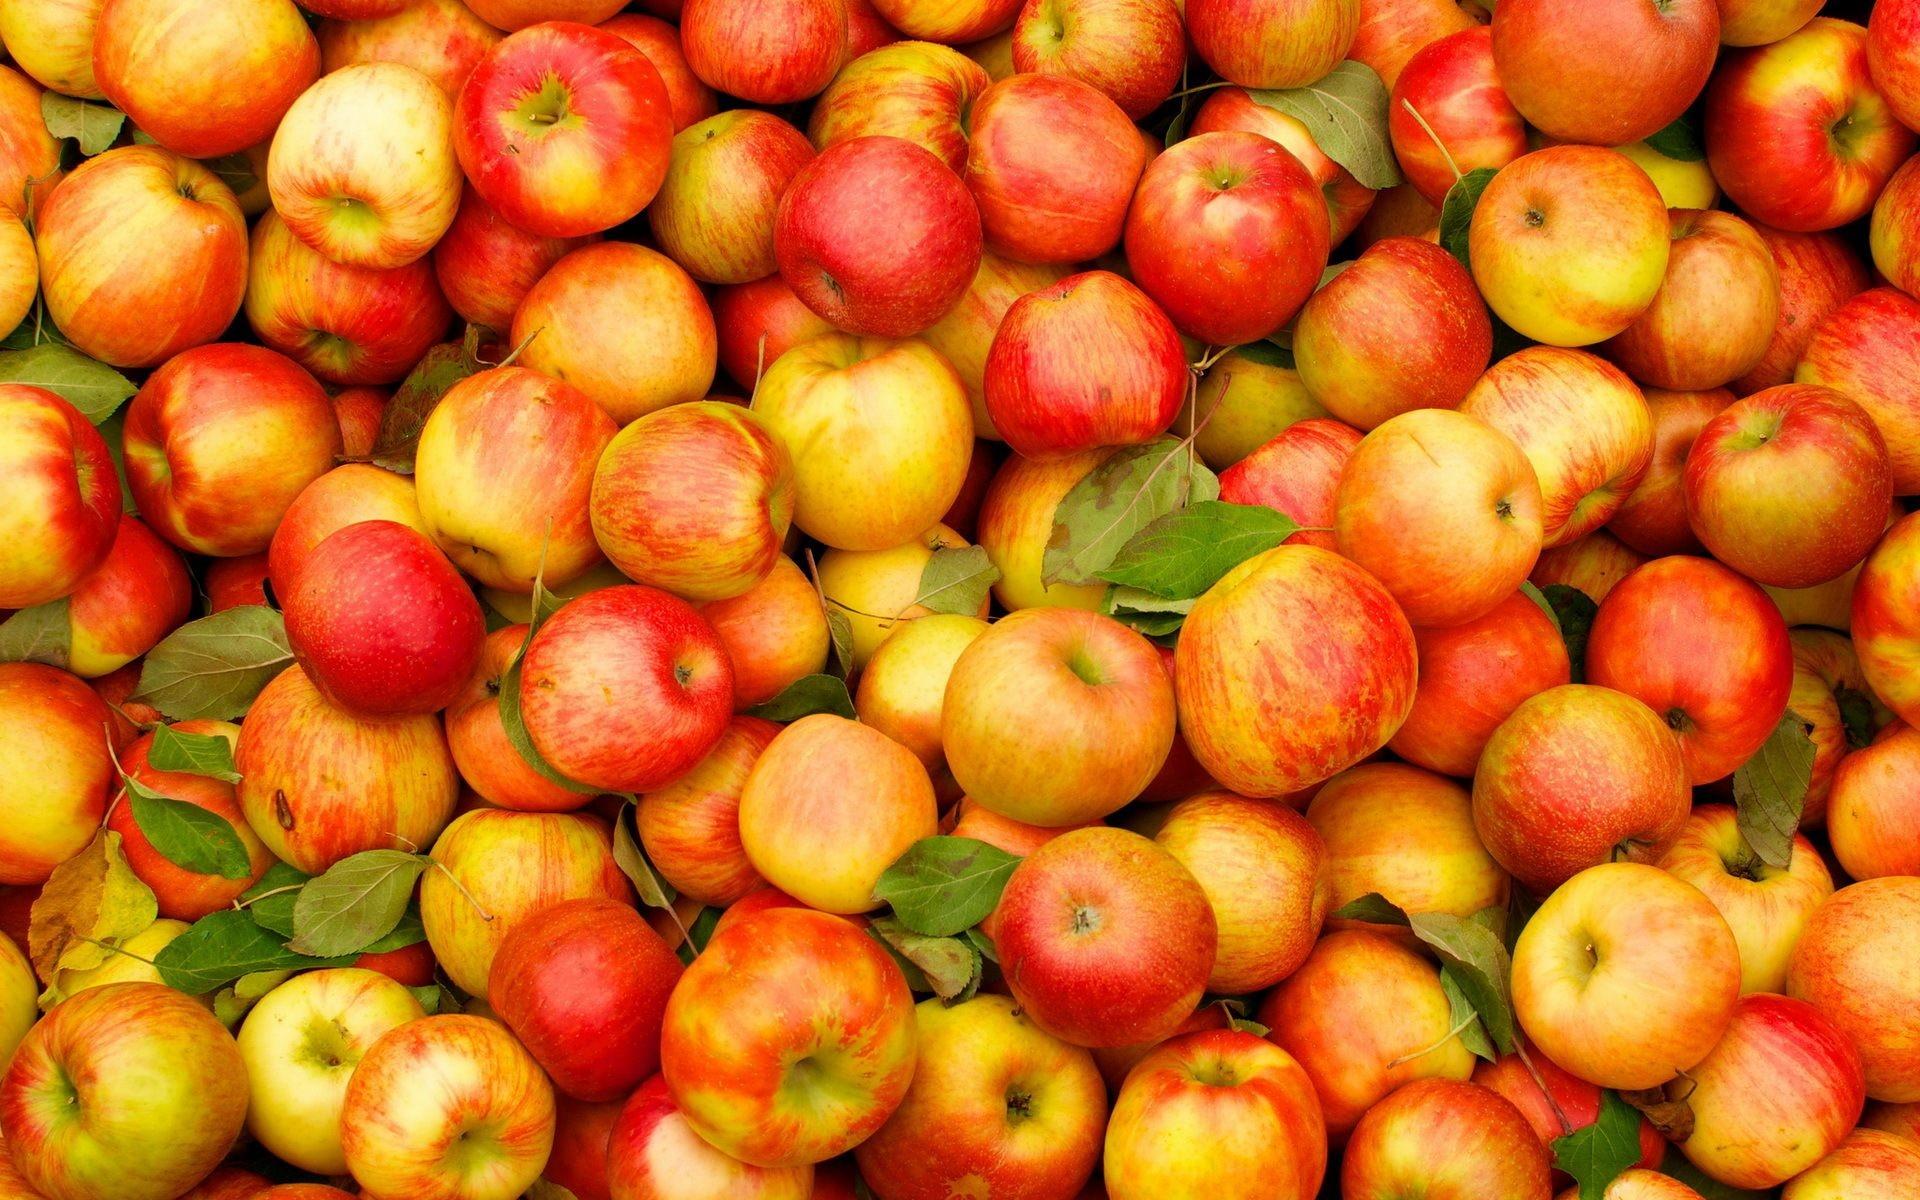 Fruit Slice 4k Hd Desktop Wallpaper